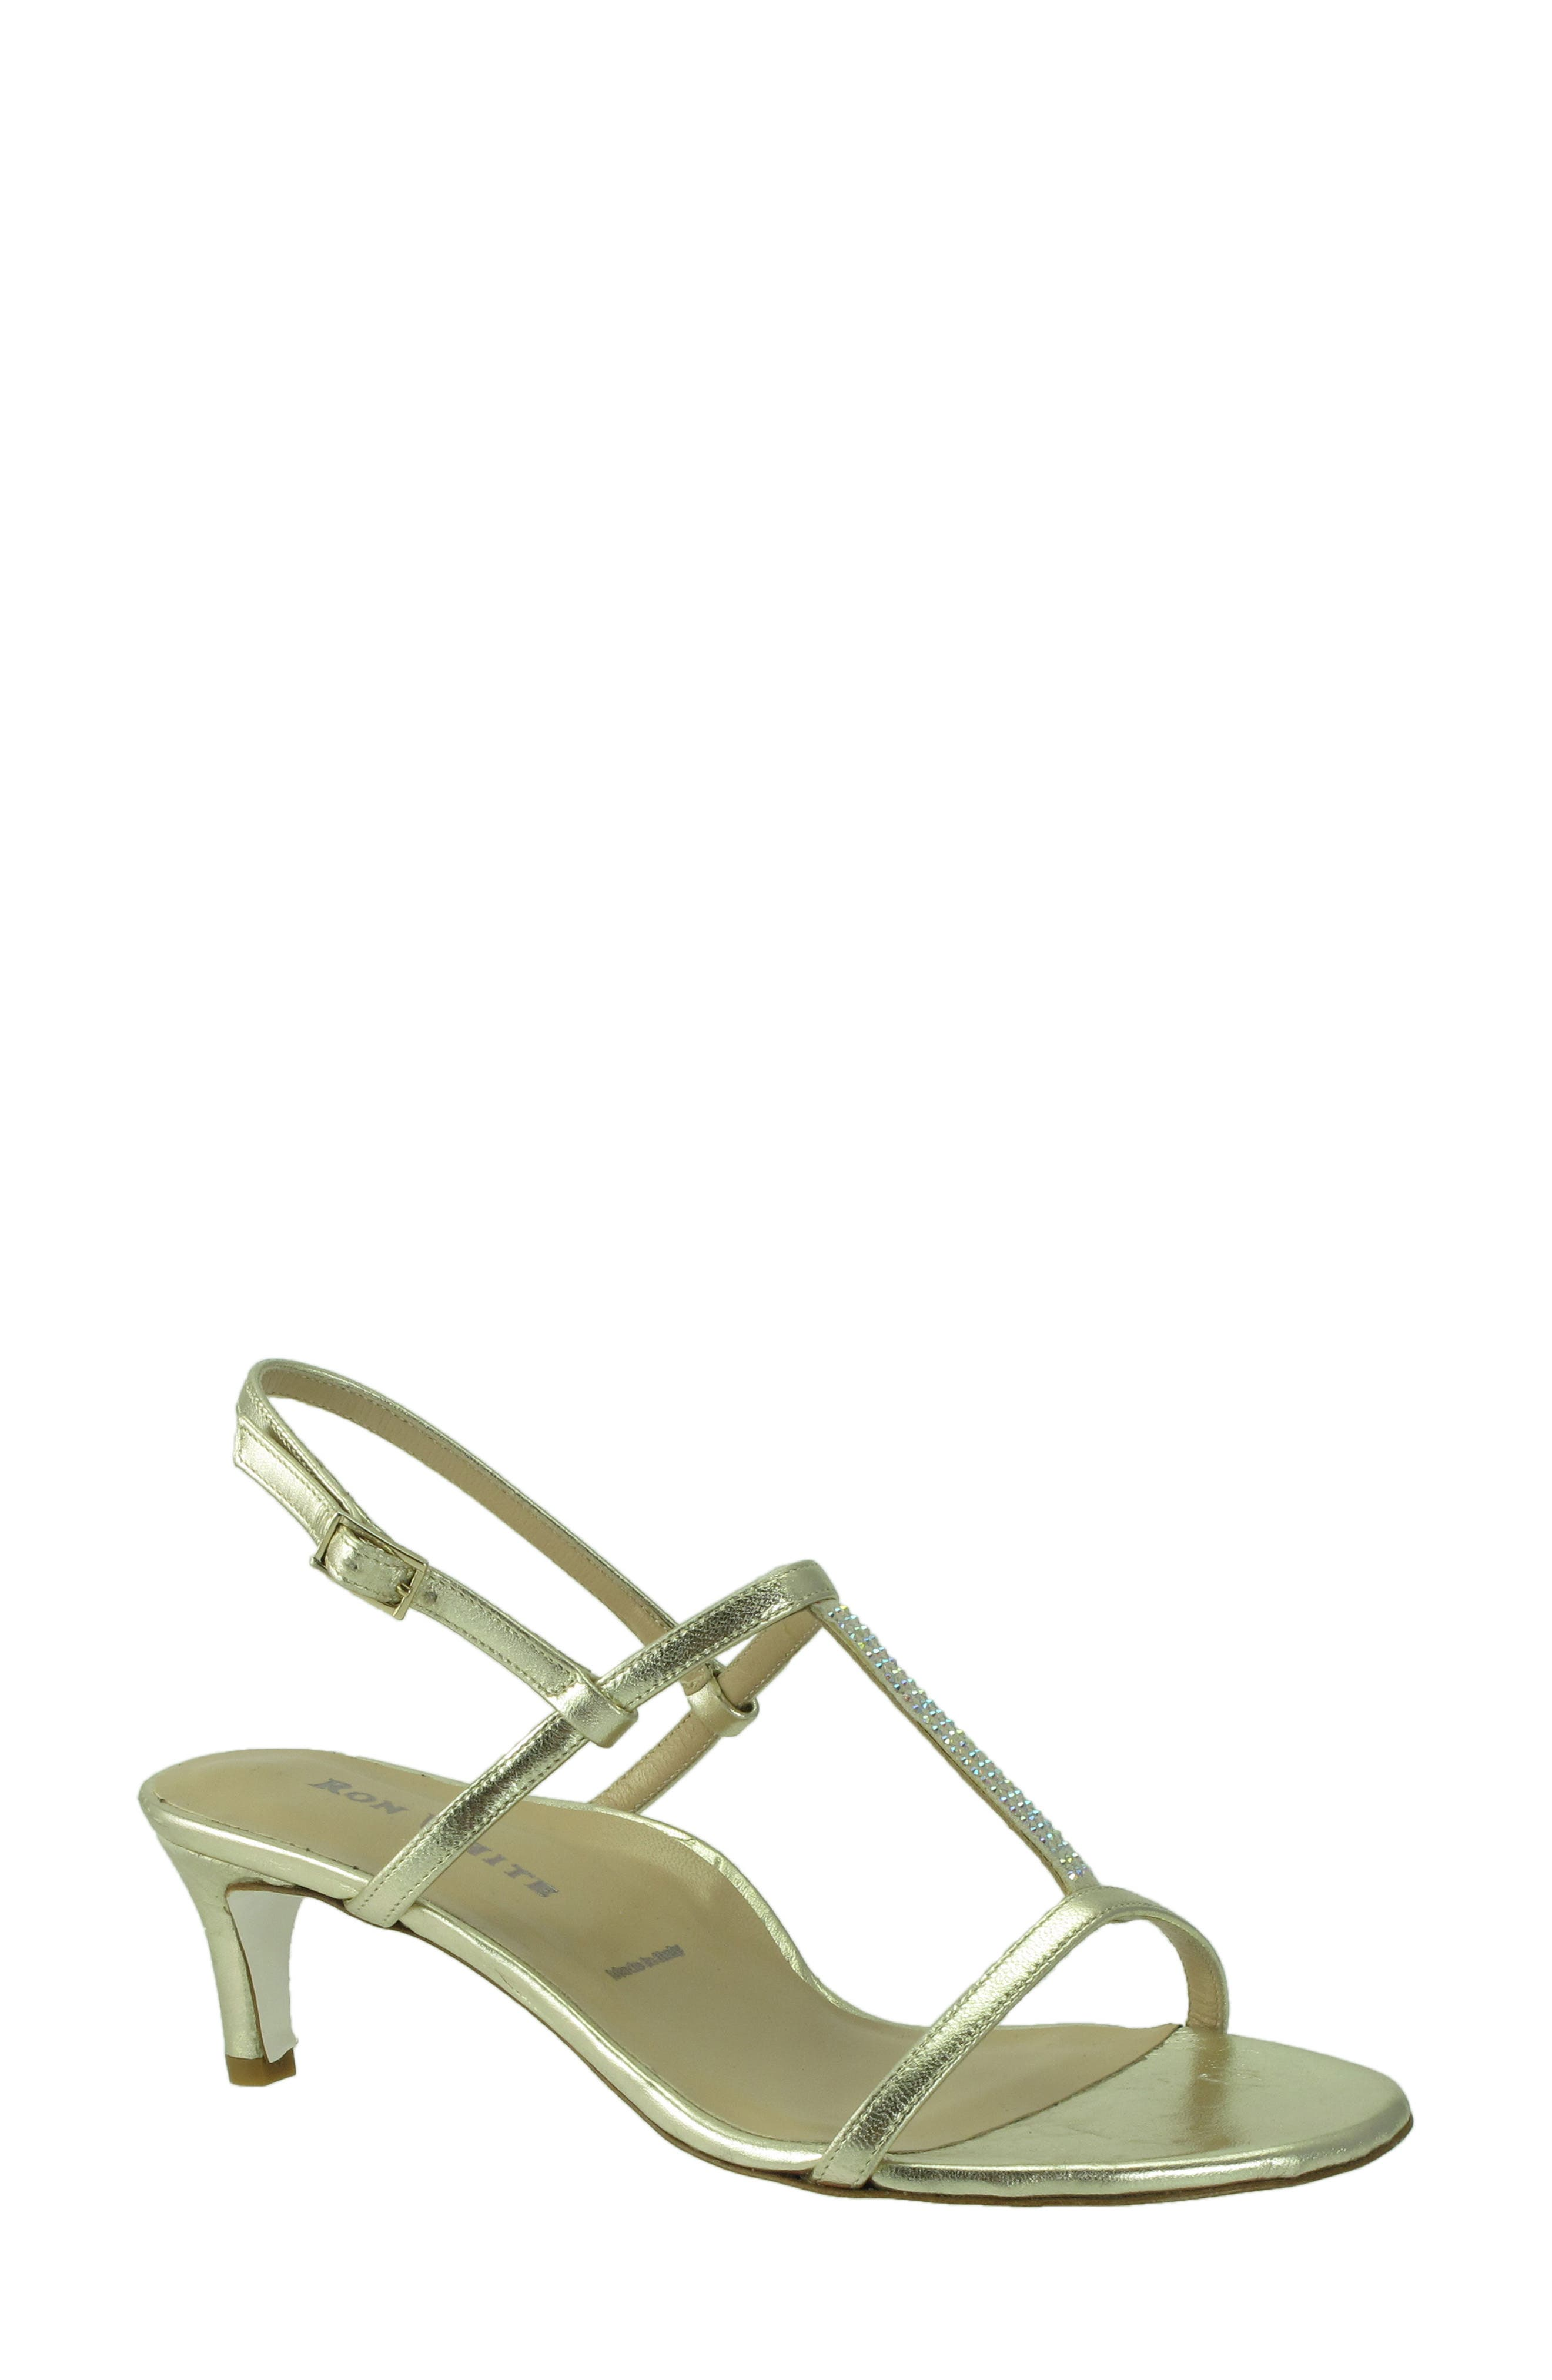 Floto Sandal,                         Main,                         color, Platino Leather